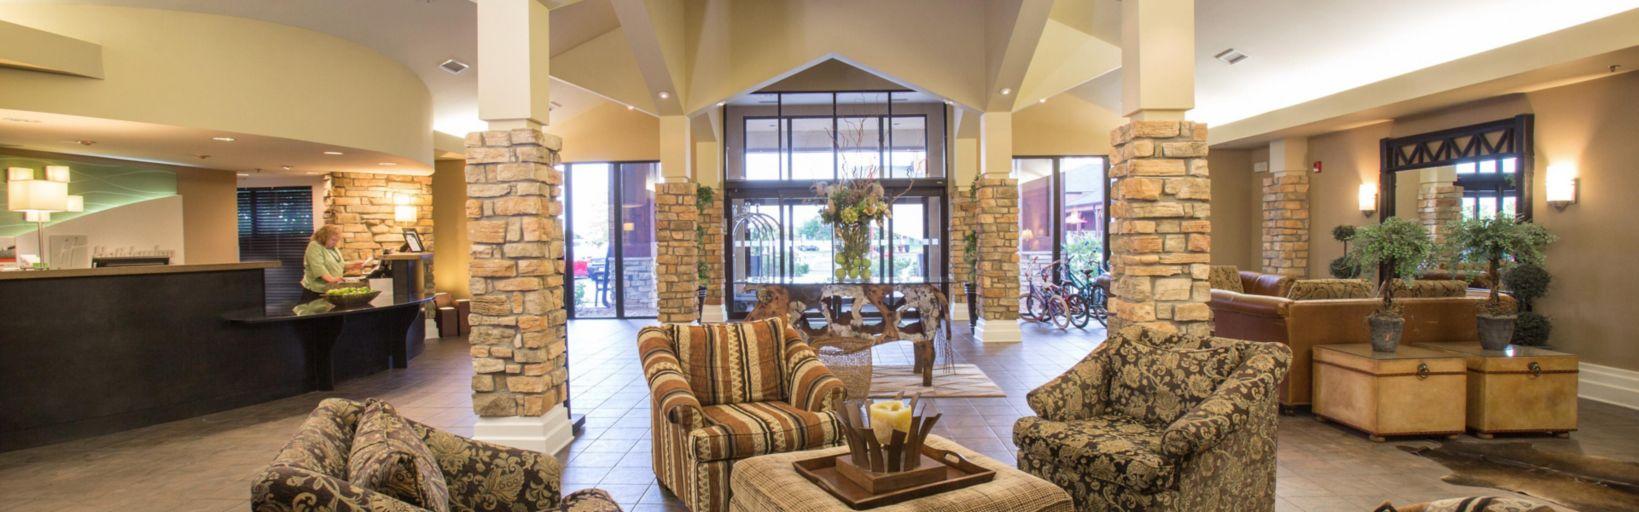 Holiday Inn Hotel & Suites St. Paul NE - Lake Elmo Hotel by IHG